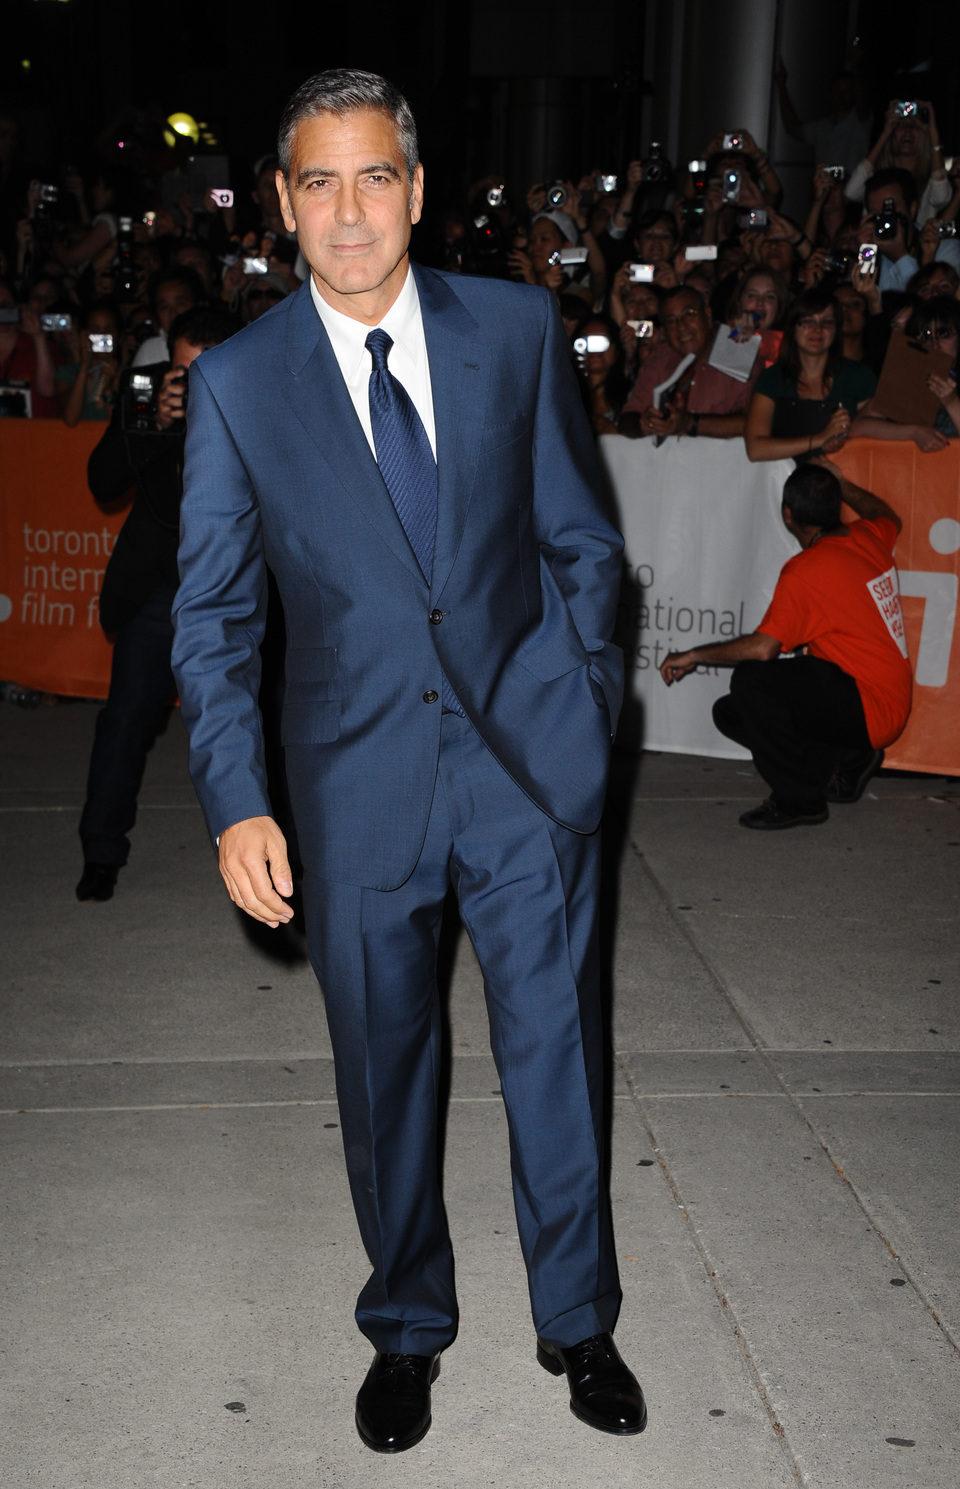 George Clooney presenta en Toronto 'The ides of march'